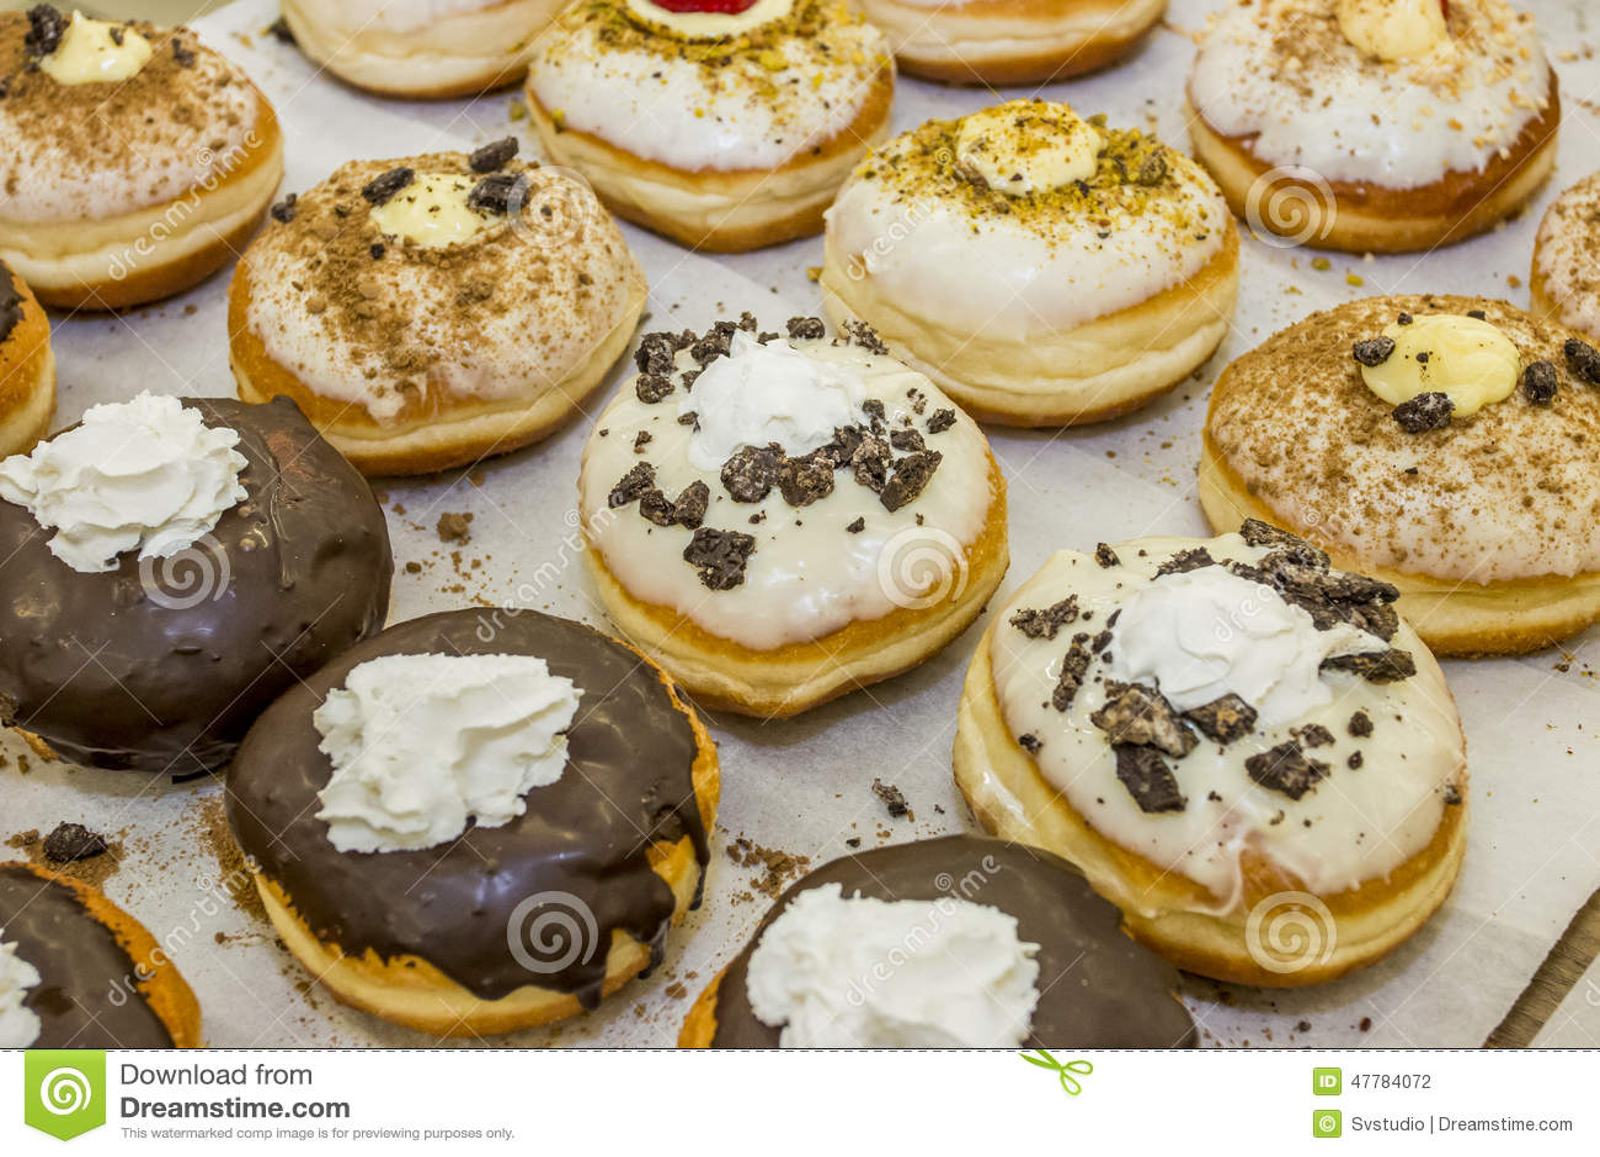 ... doughnuts jewish hanukkah doughnuts recipes dishmaps jewish boy eating